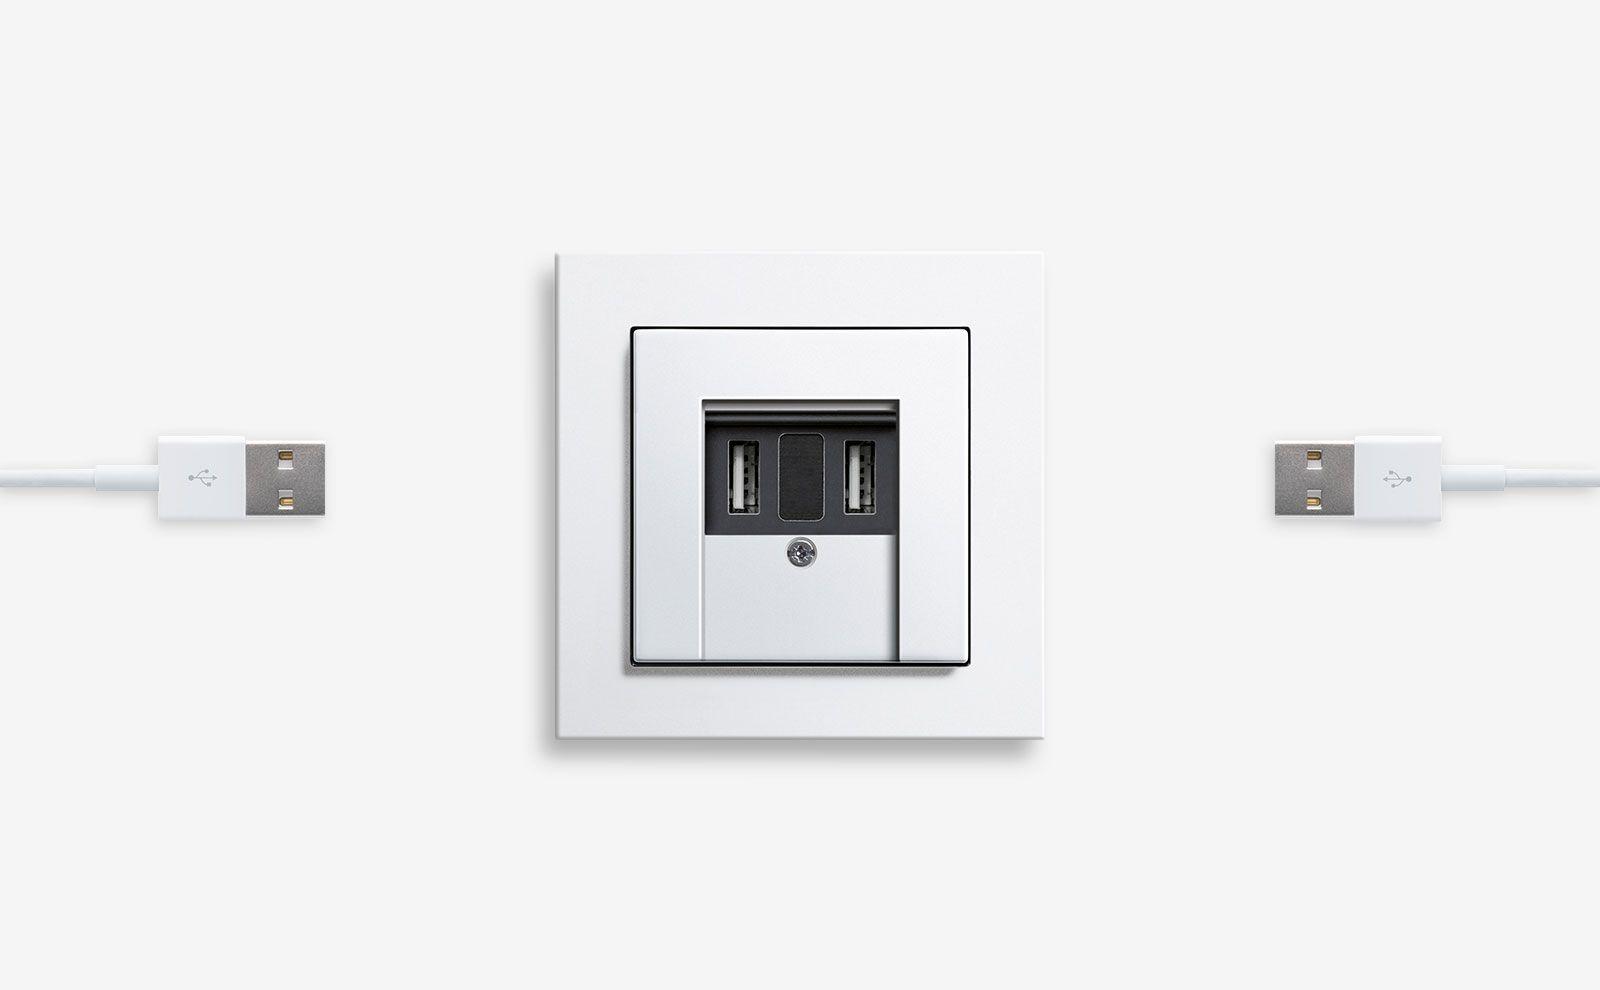 Gira USB-Spannungsversorgung 2fach, E2, Farbe Reinweiß glänzend